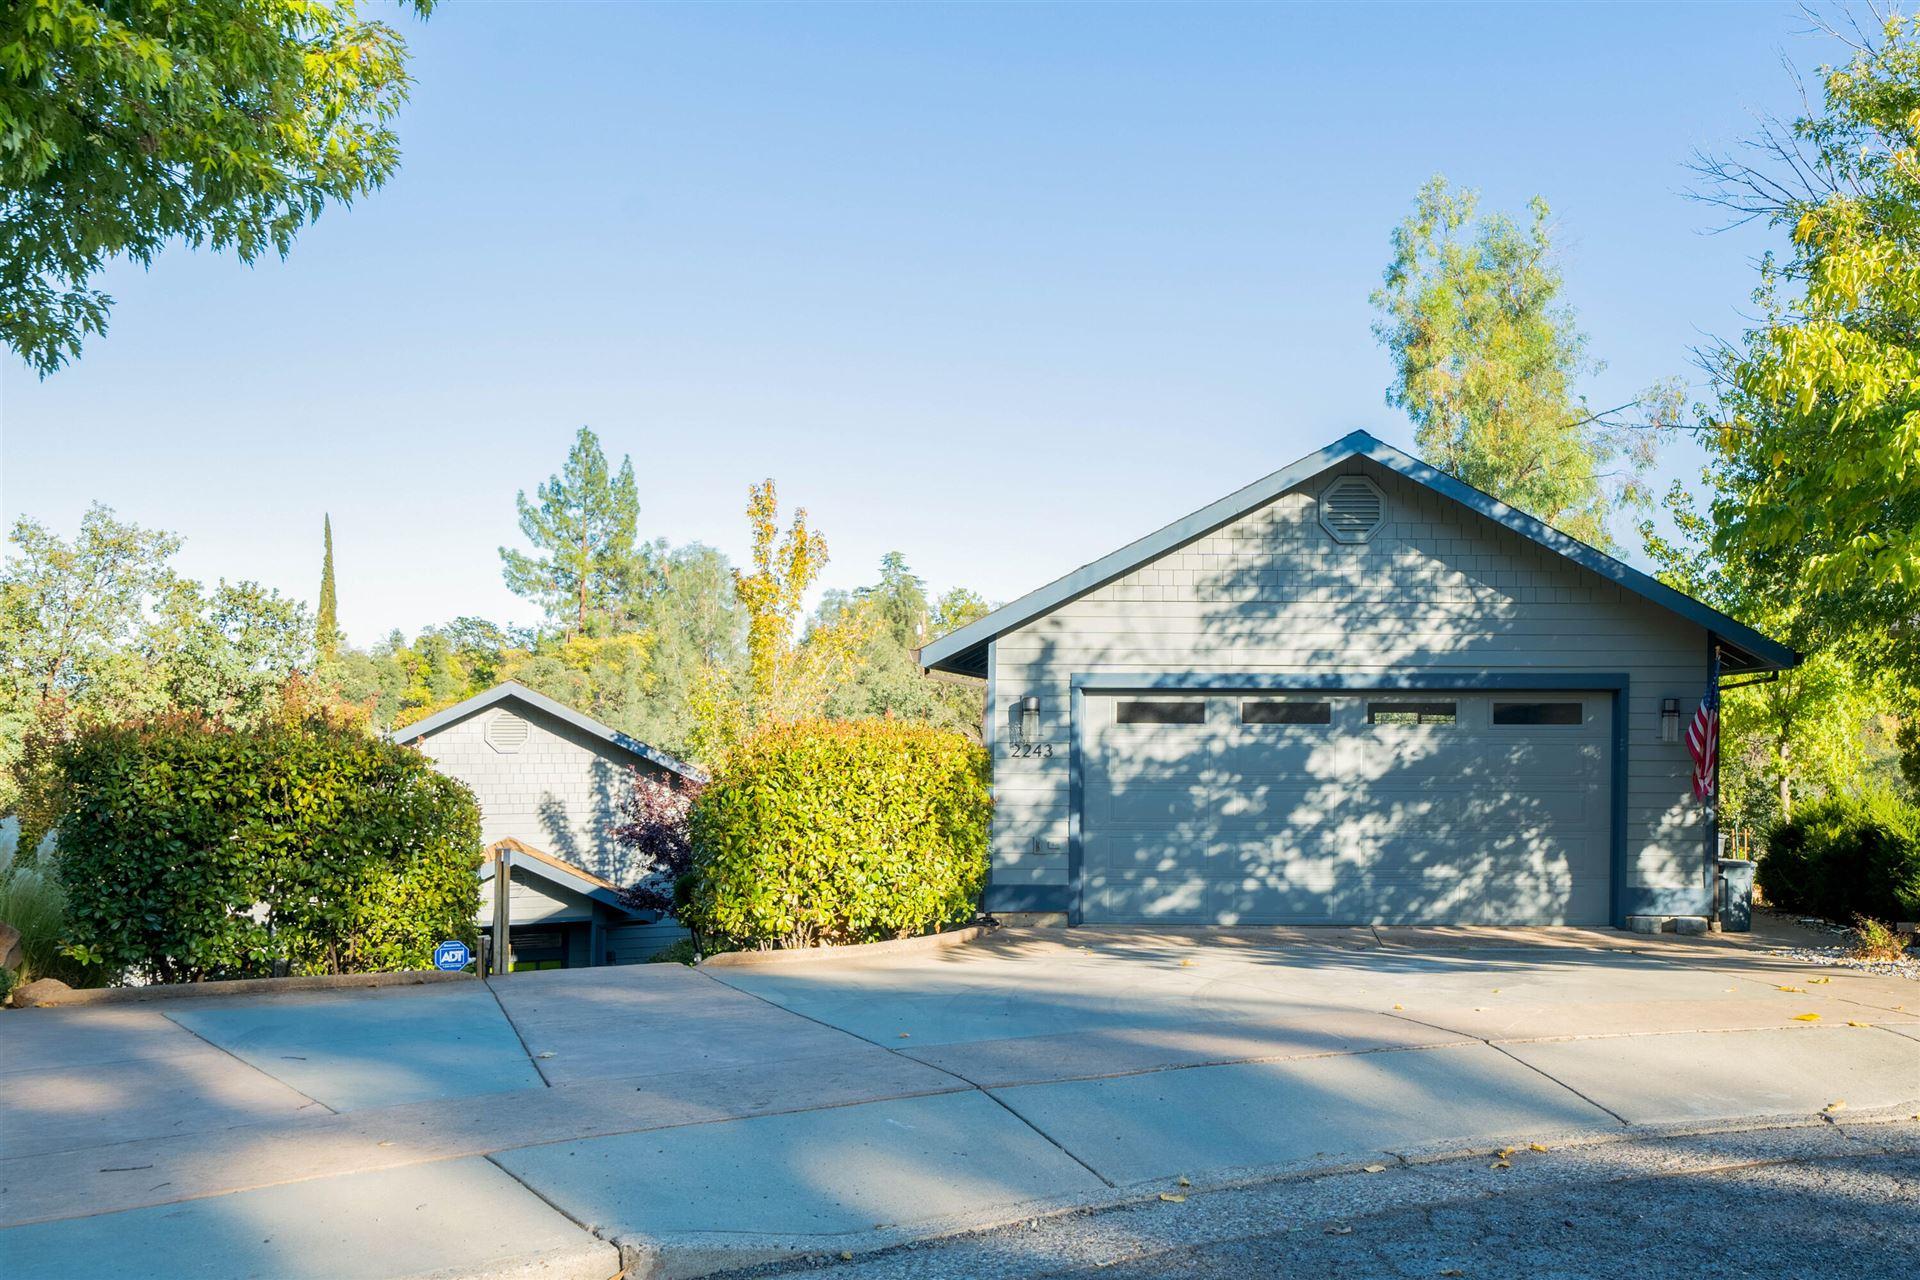 Photo of 2243 Oak Ridge Ct, Redding, CA 96001 (MLS # 21-4844)